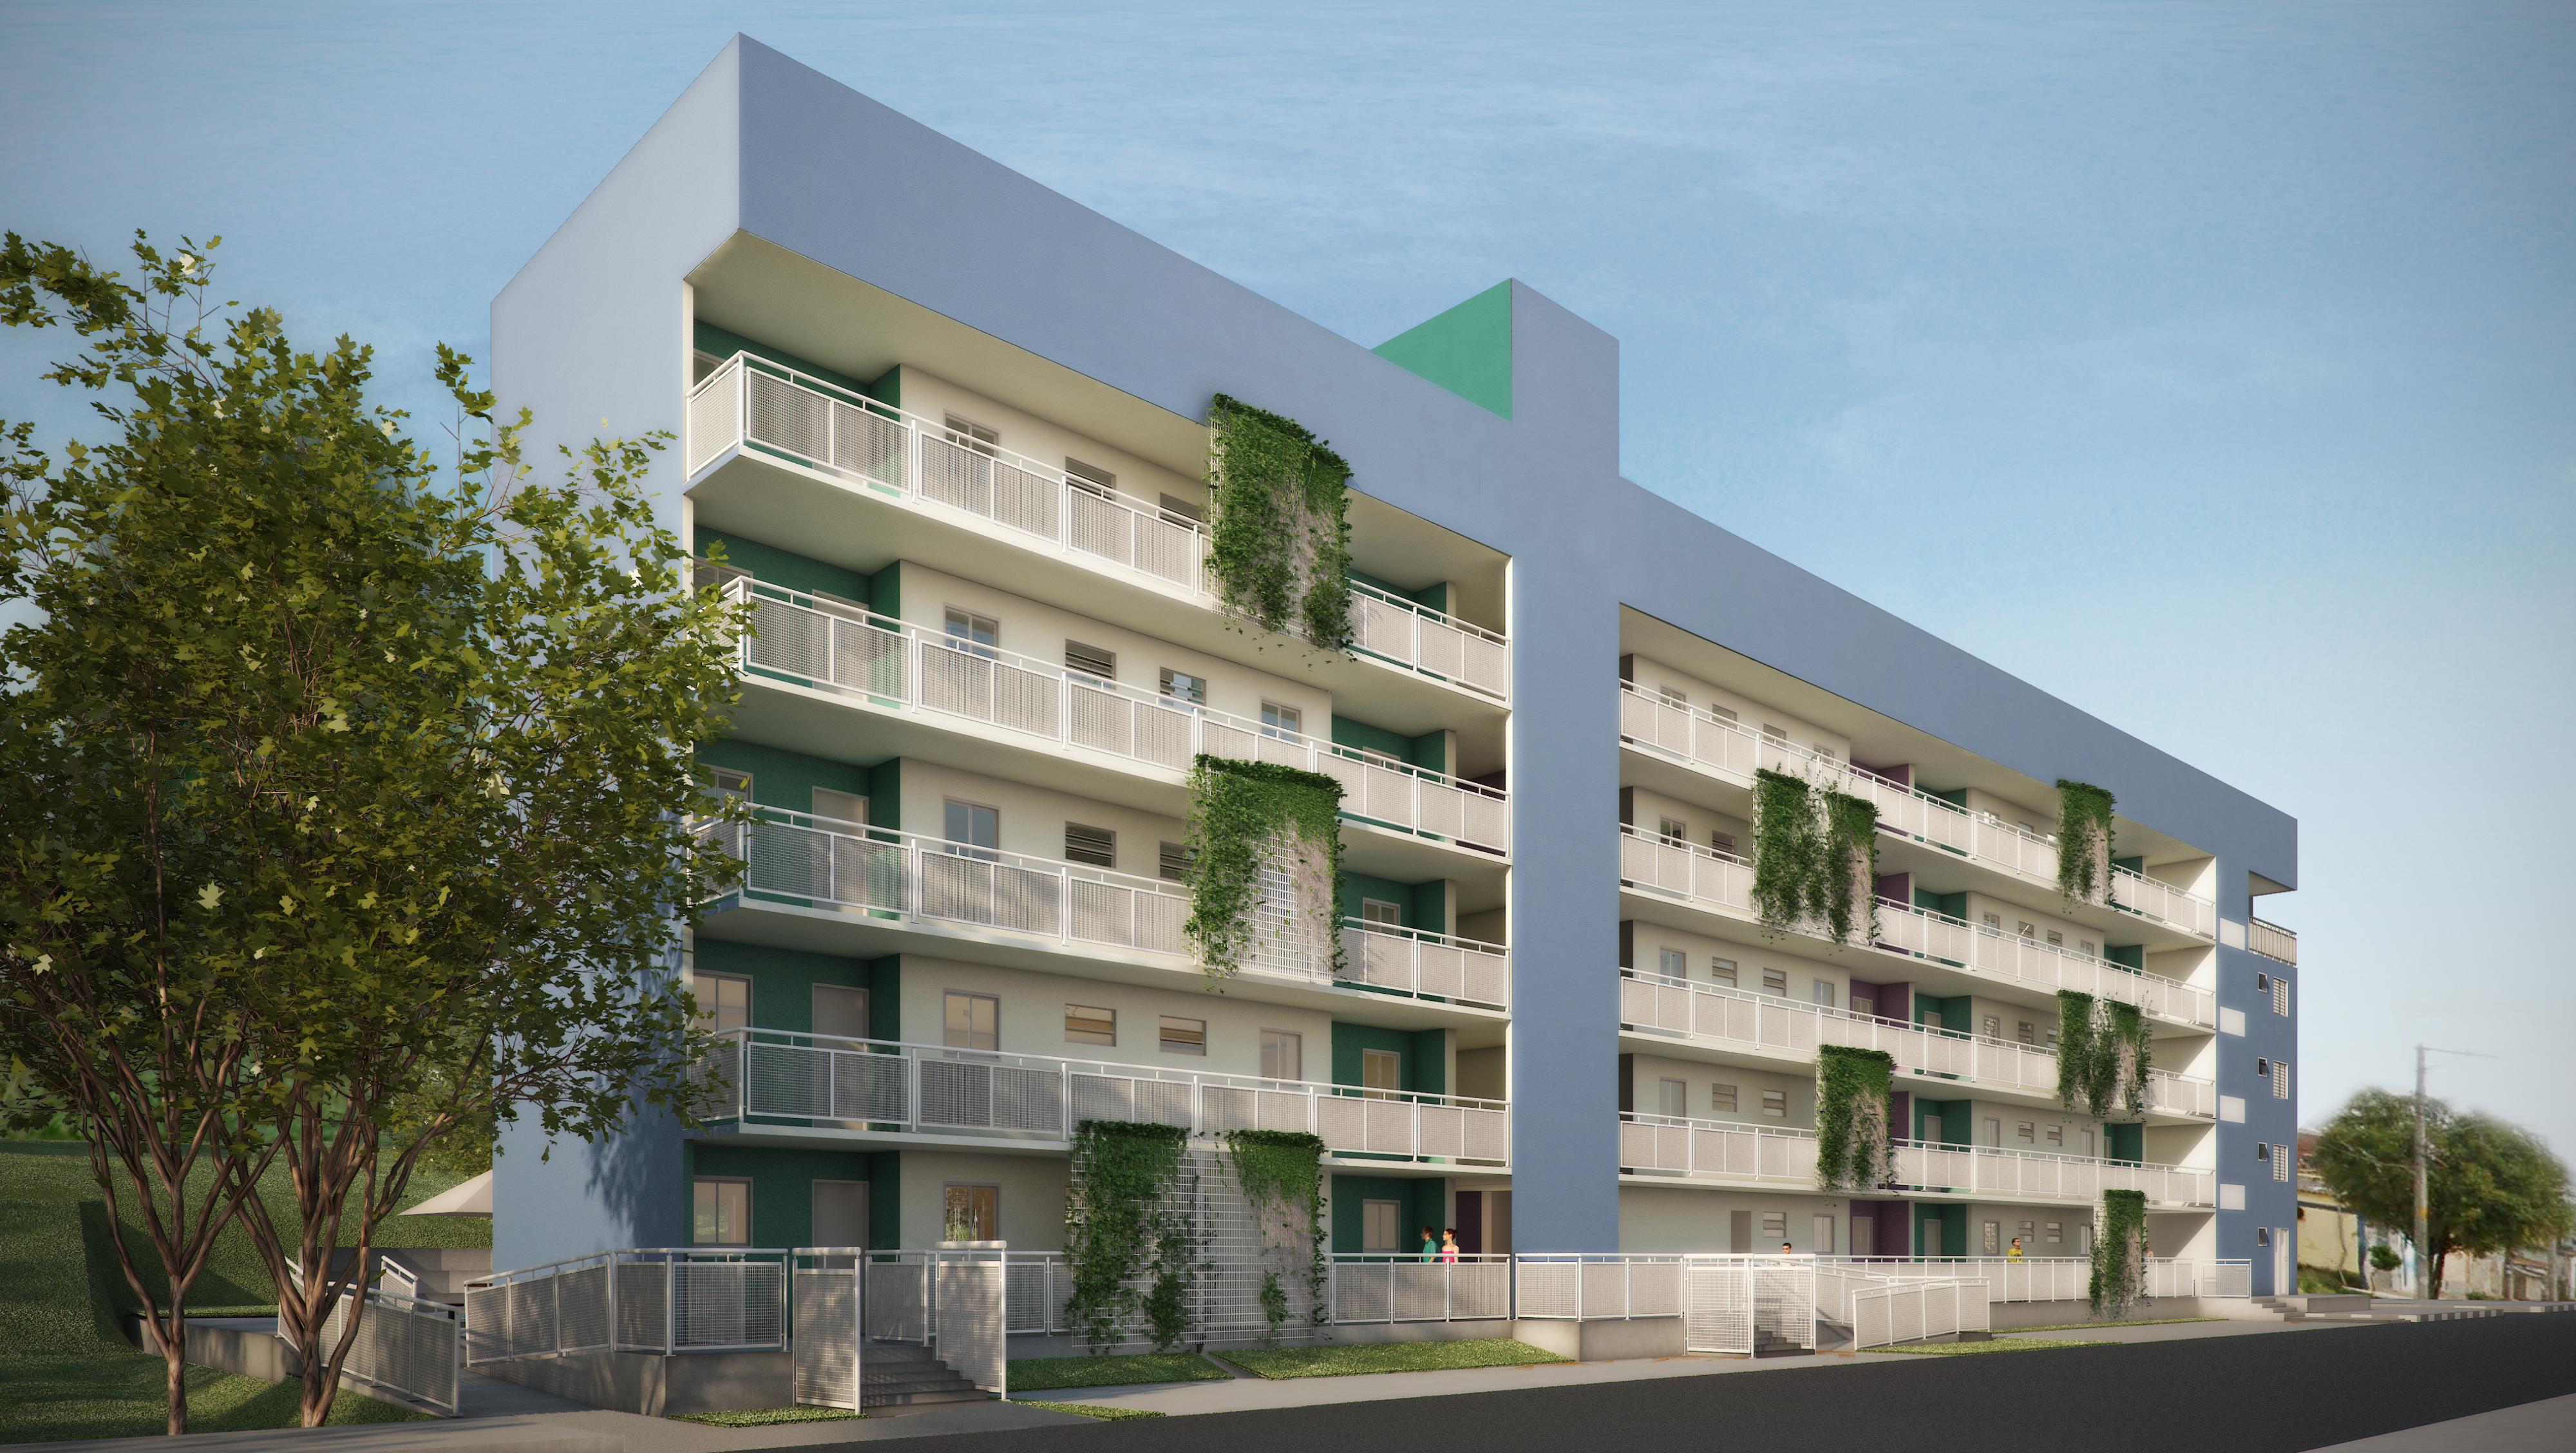 Social Housing - São Paulo - Study